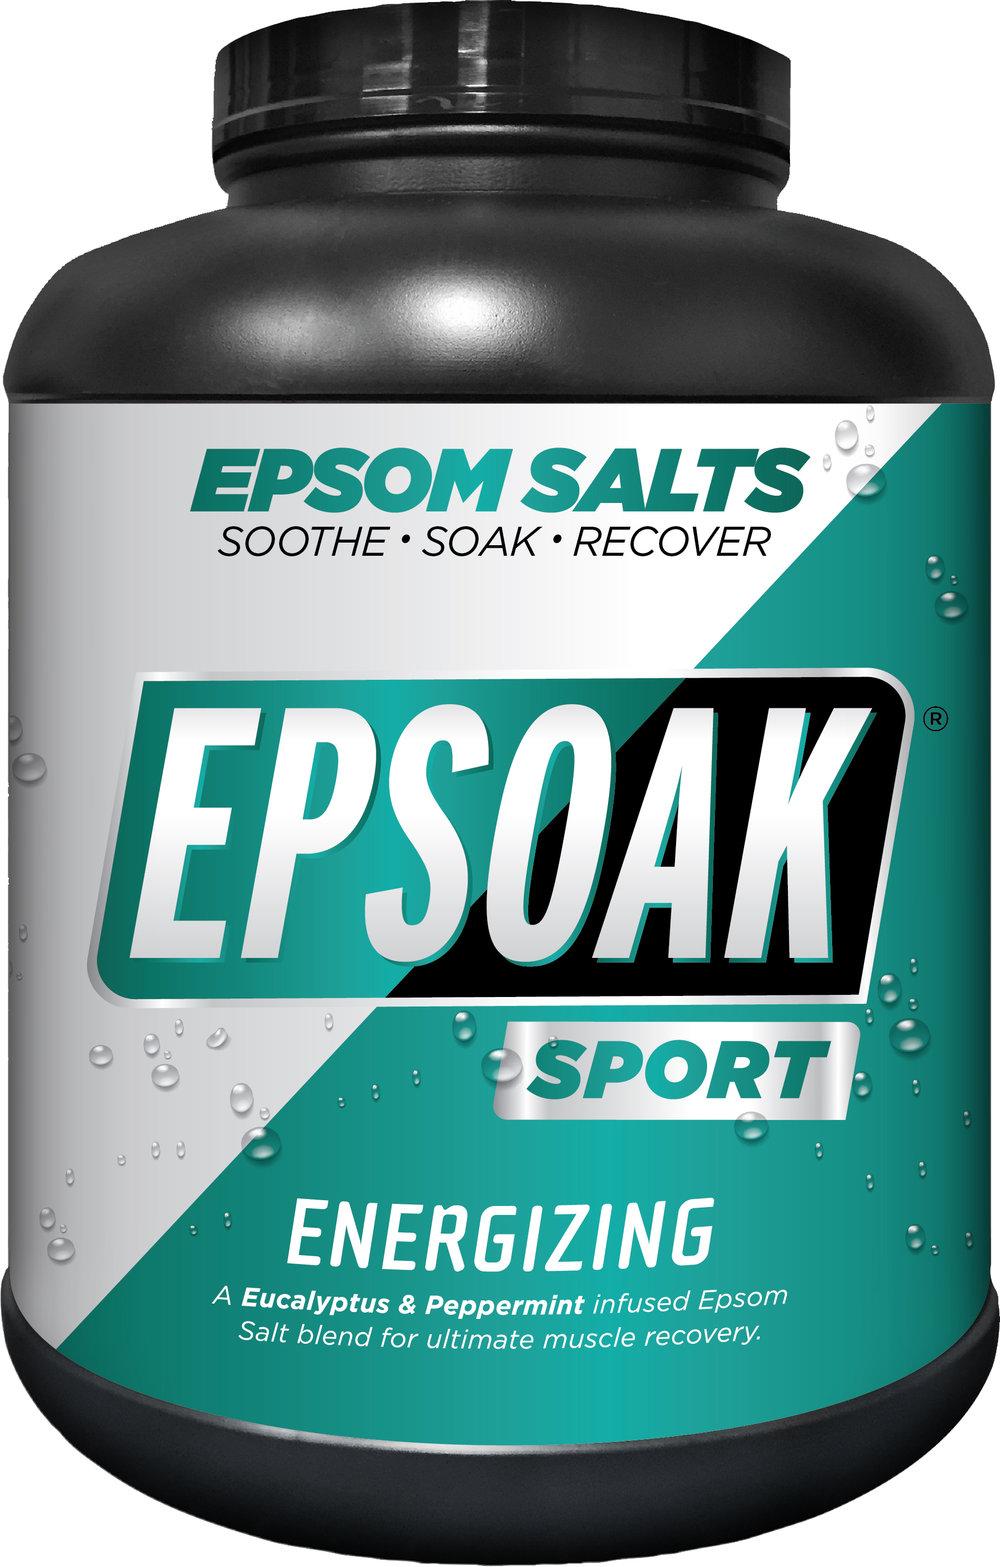 EPSOAK-SPORT_ENERGIZING_FRONT.jpg